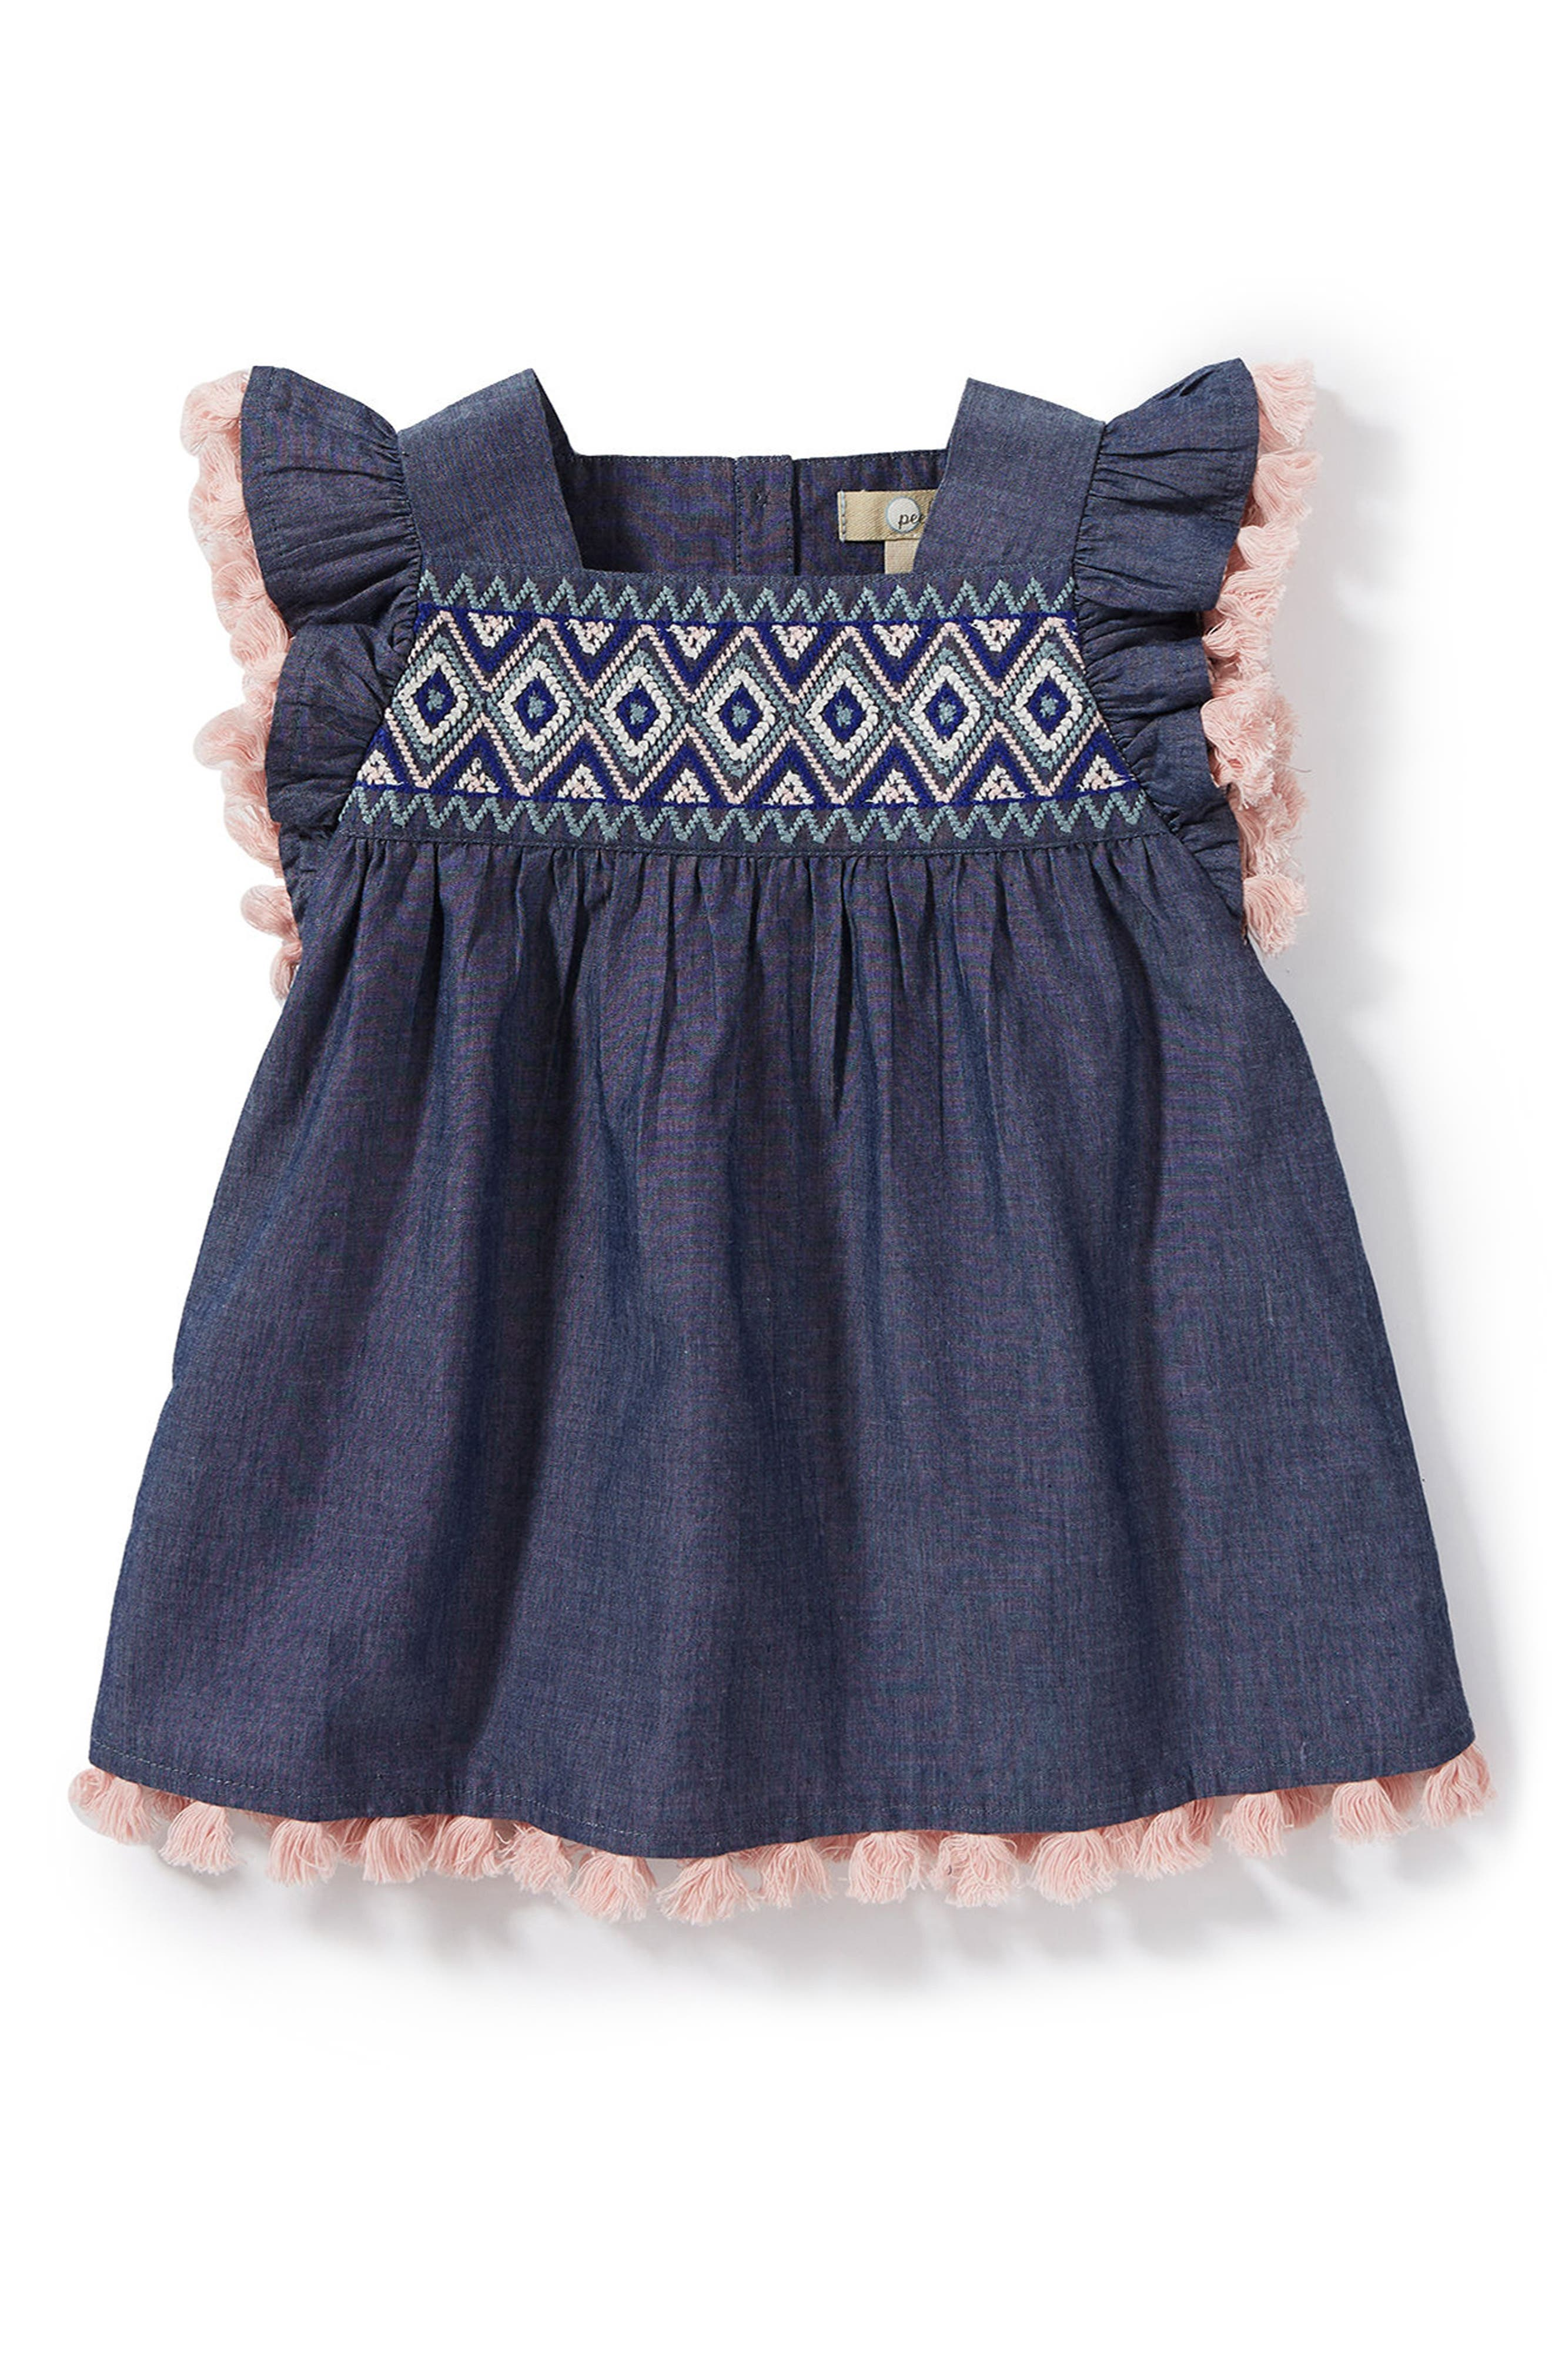 Main Image - Peek Sophia Dress (Baby Girls)